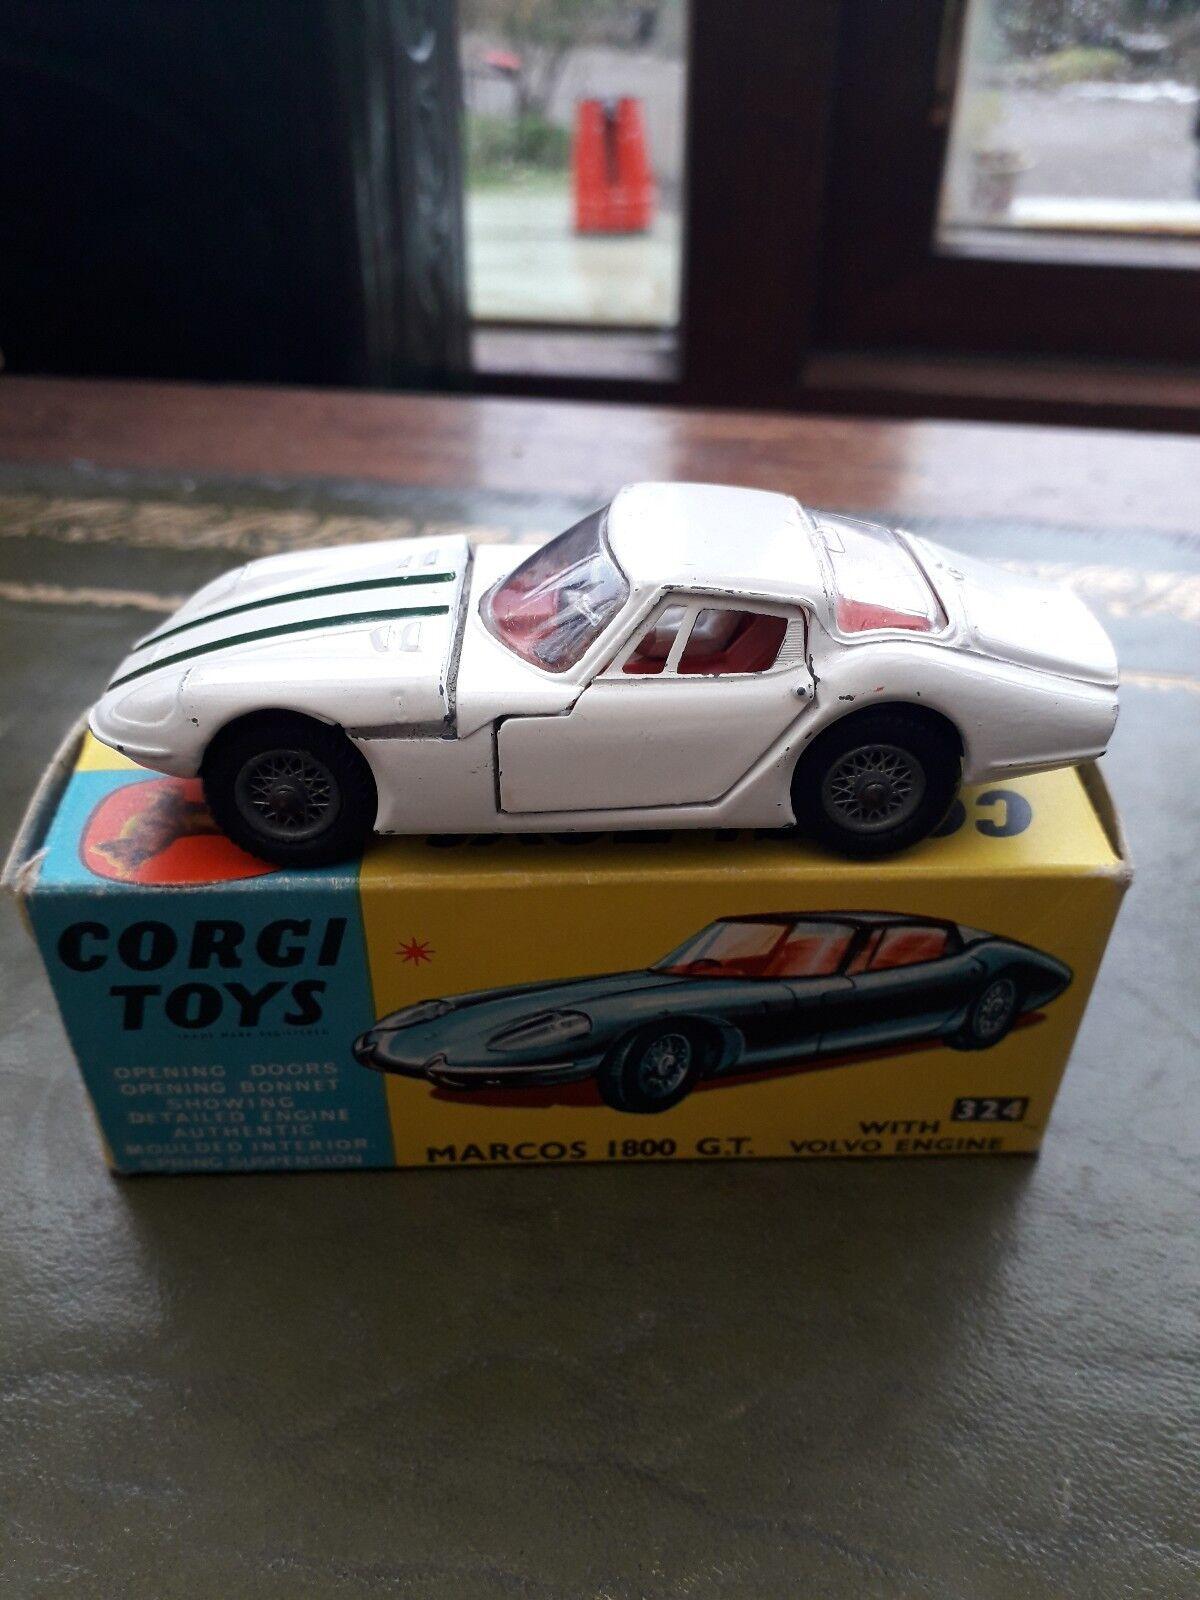 Corgi Toys No. 324, Marcos 1800GT, with Volvo Engine near mint in near mint box.